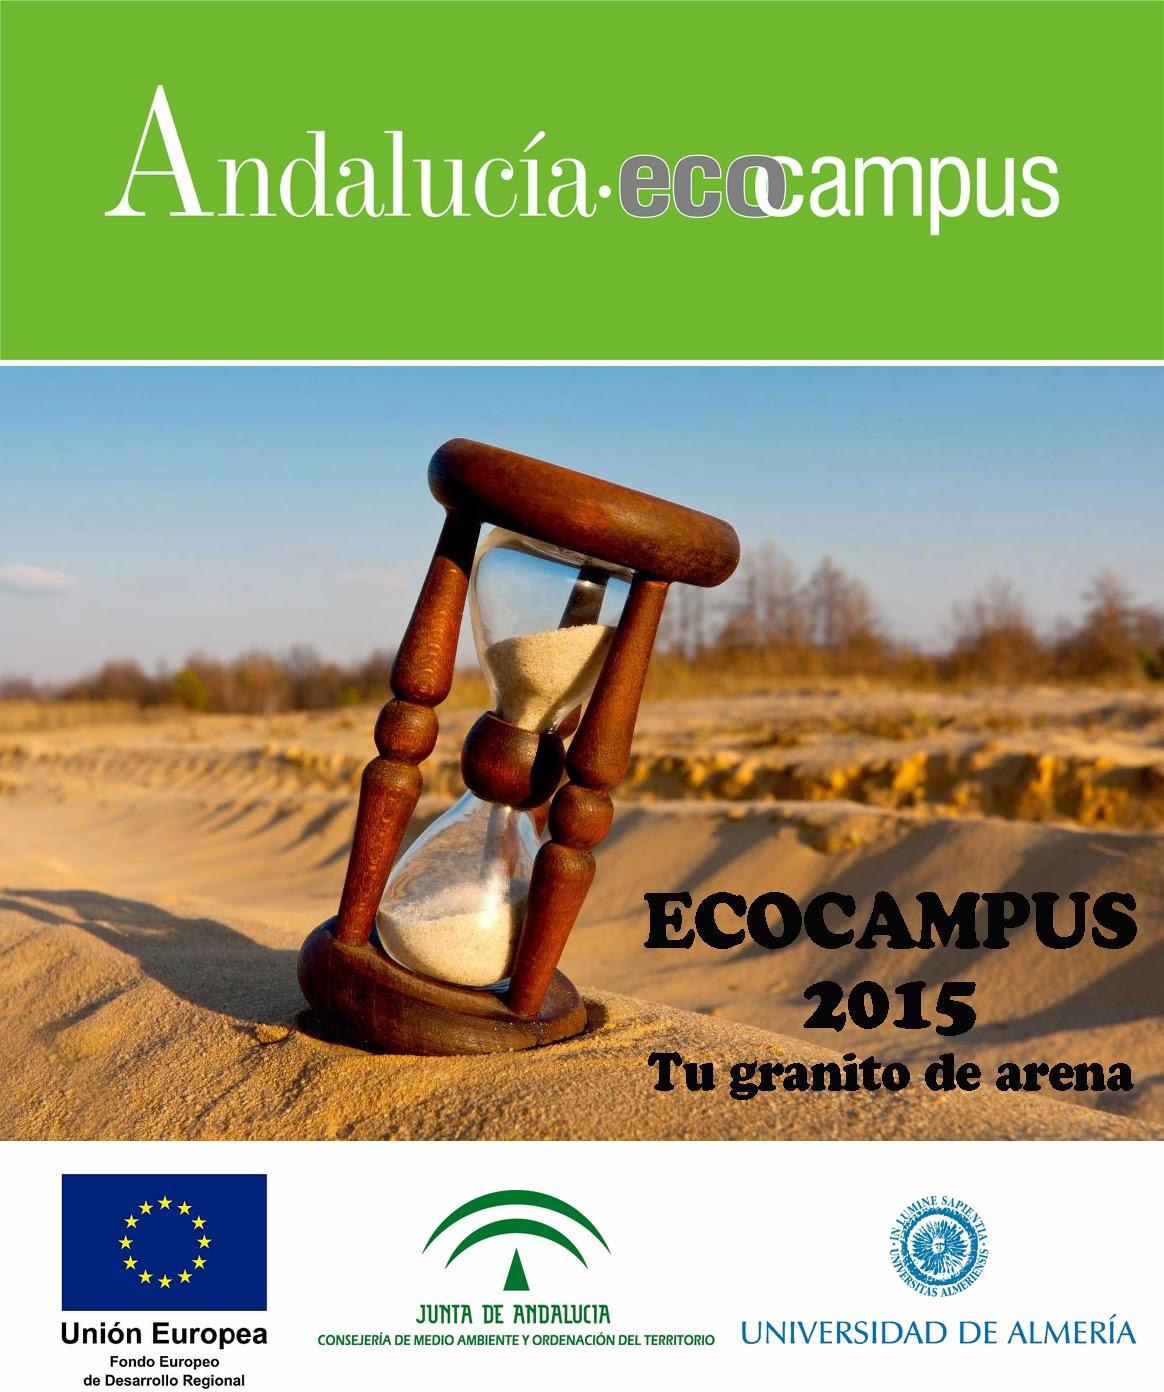 ECOCAMPUS UAL 2015